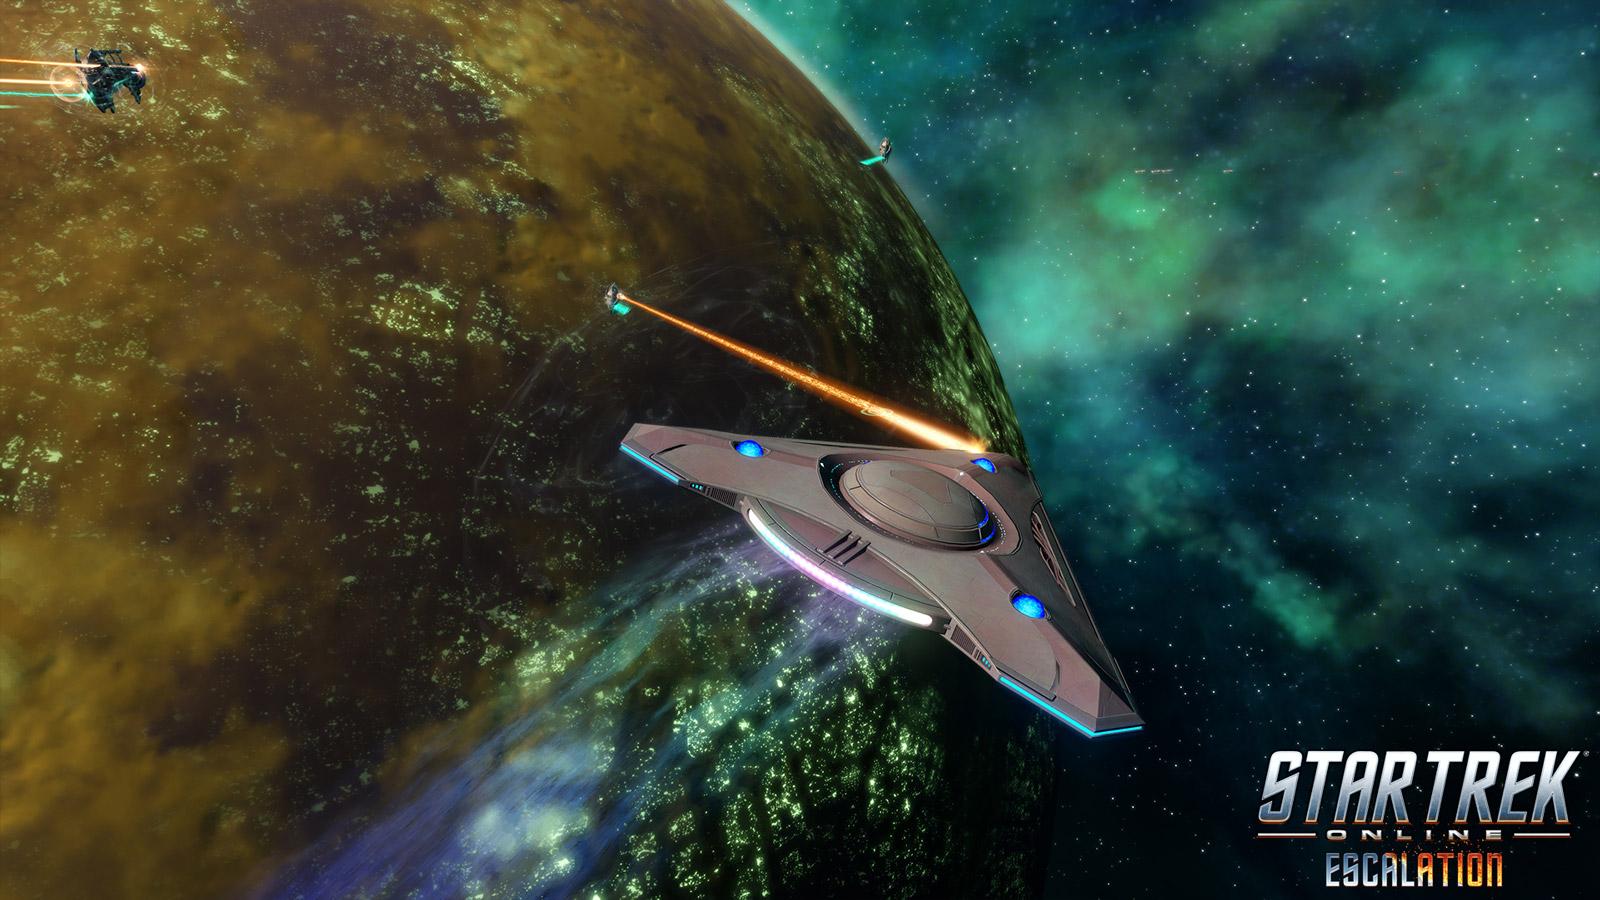 Free Star Trek Online Wallpaper in 1600x900